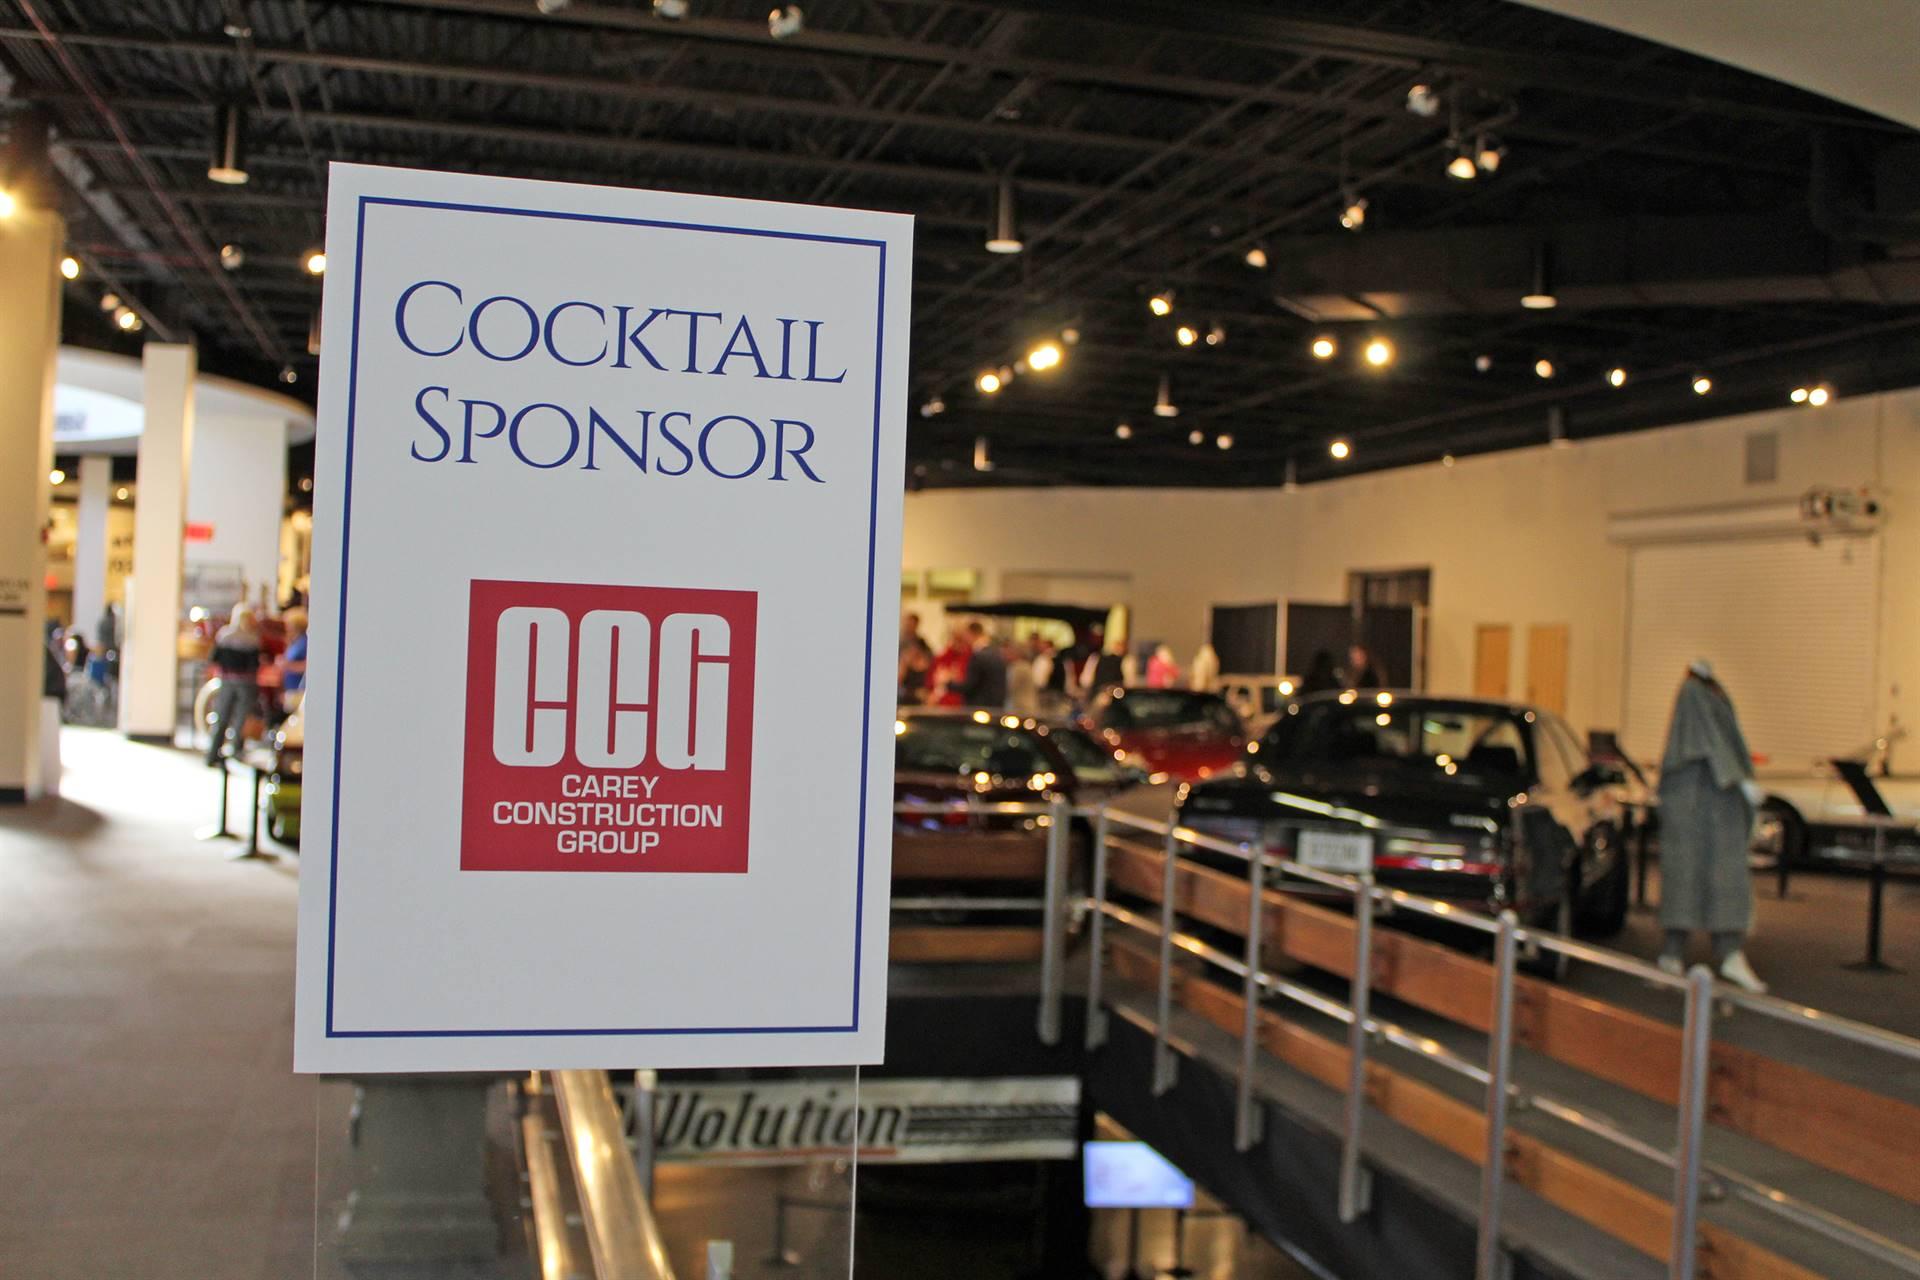 Cocktail-Sponsor-CCG